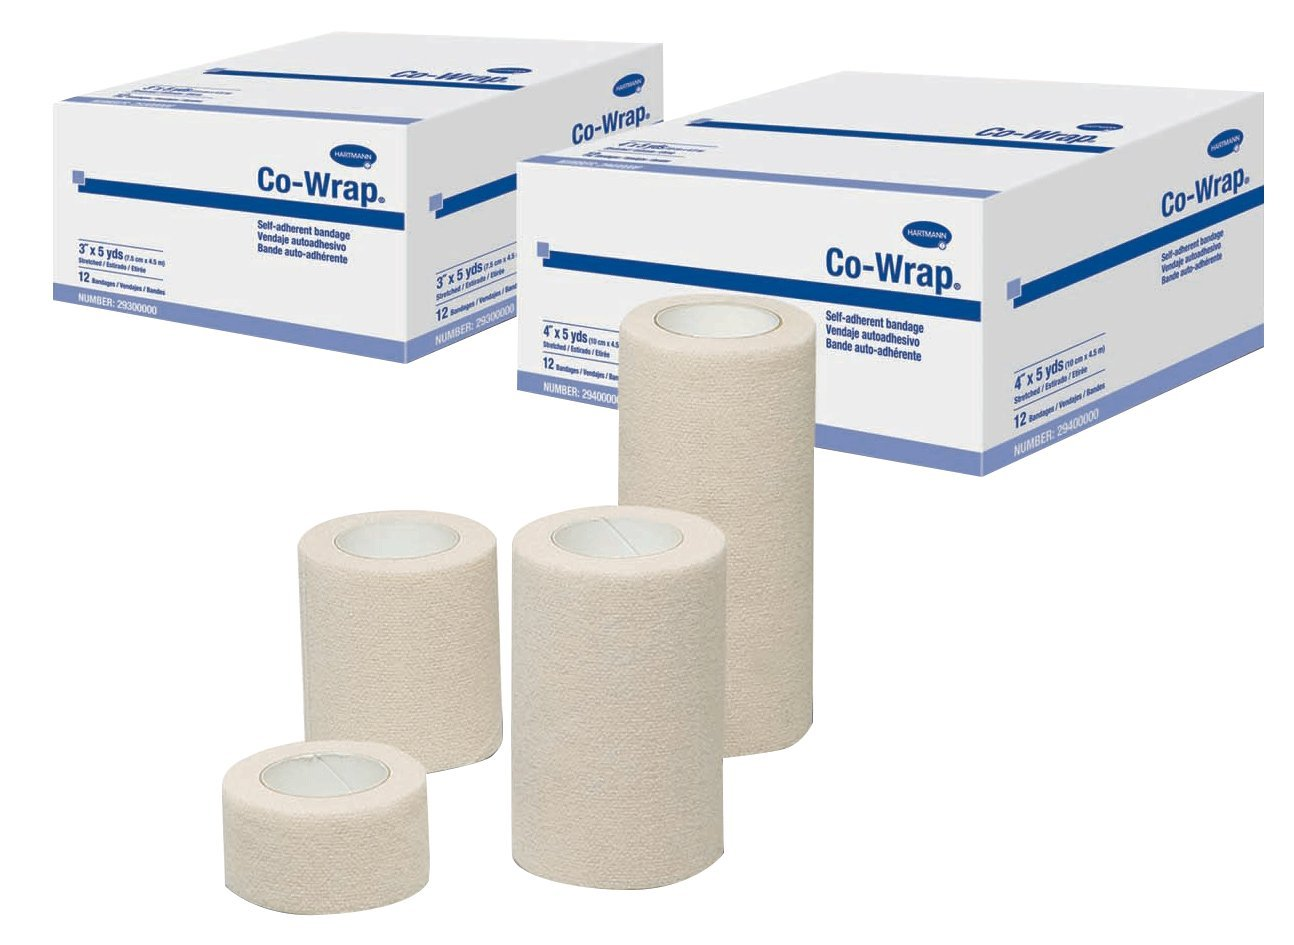 Hartmann 29200000 Co-Wrap Self-Adherent Bandage, 2'' Width, 5 yd. Length (Pack of 12)